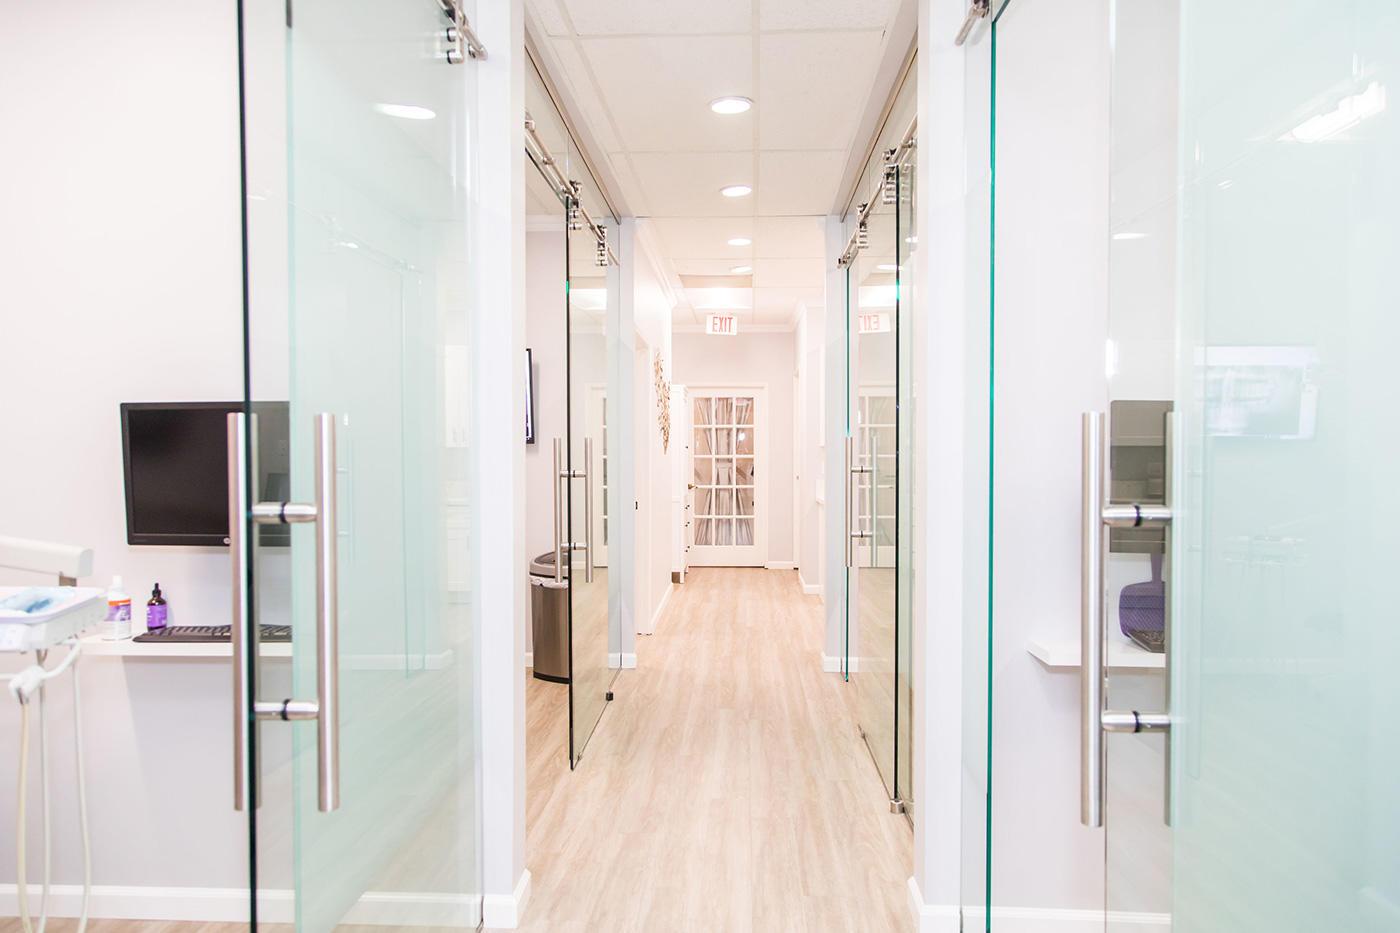 Brighton Dental San Diego - Inside The Clinic